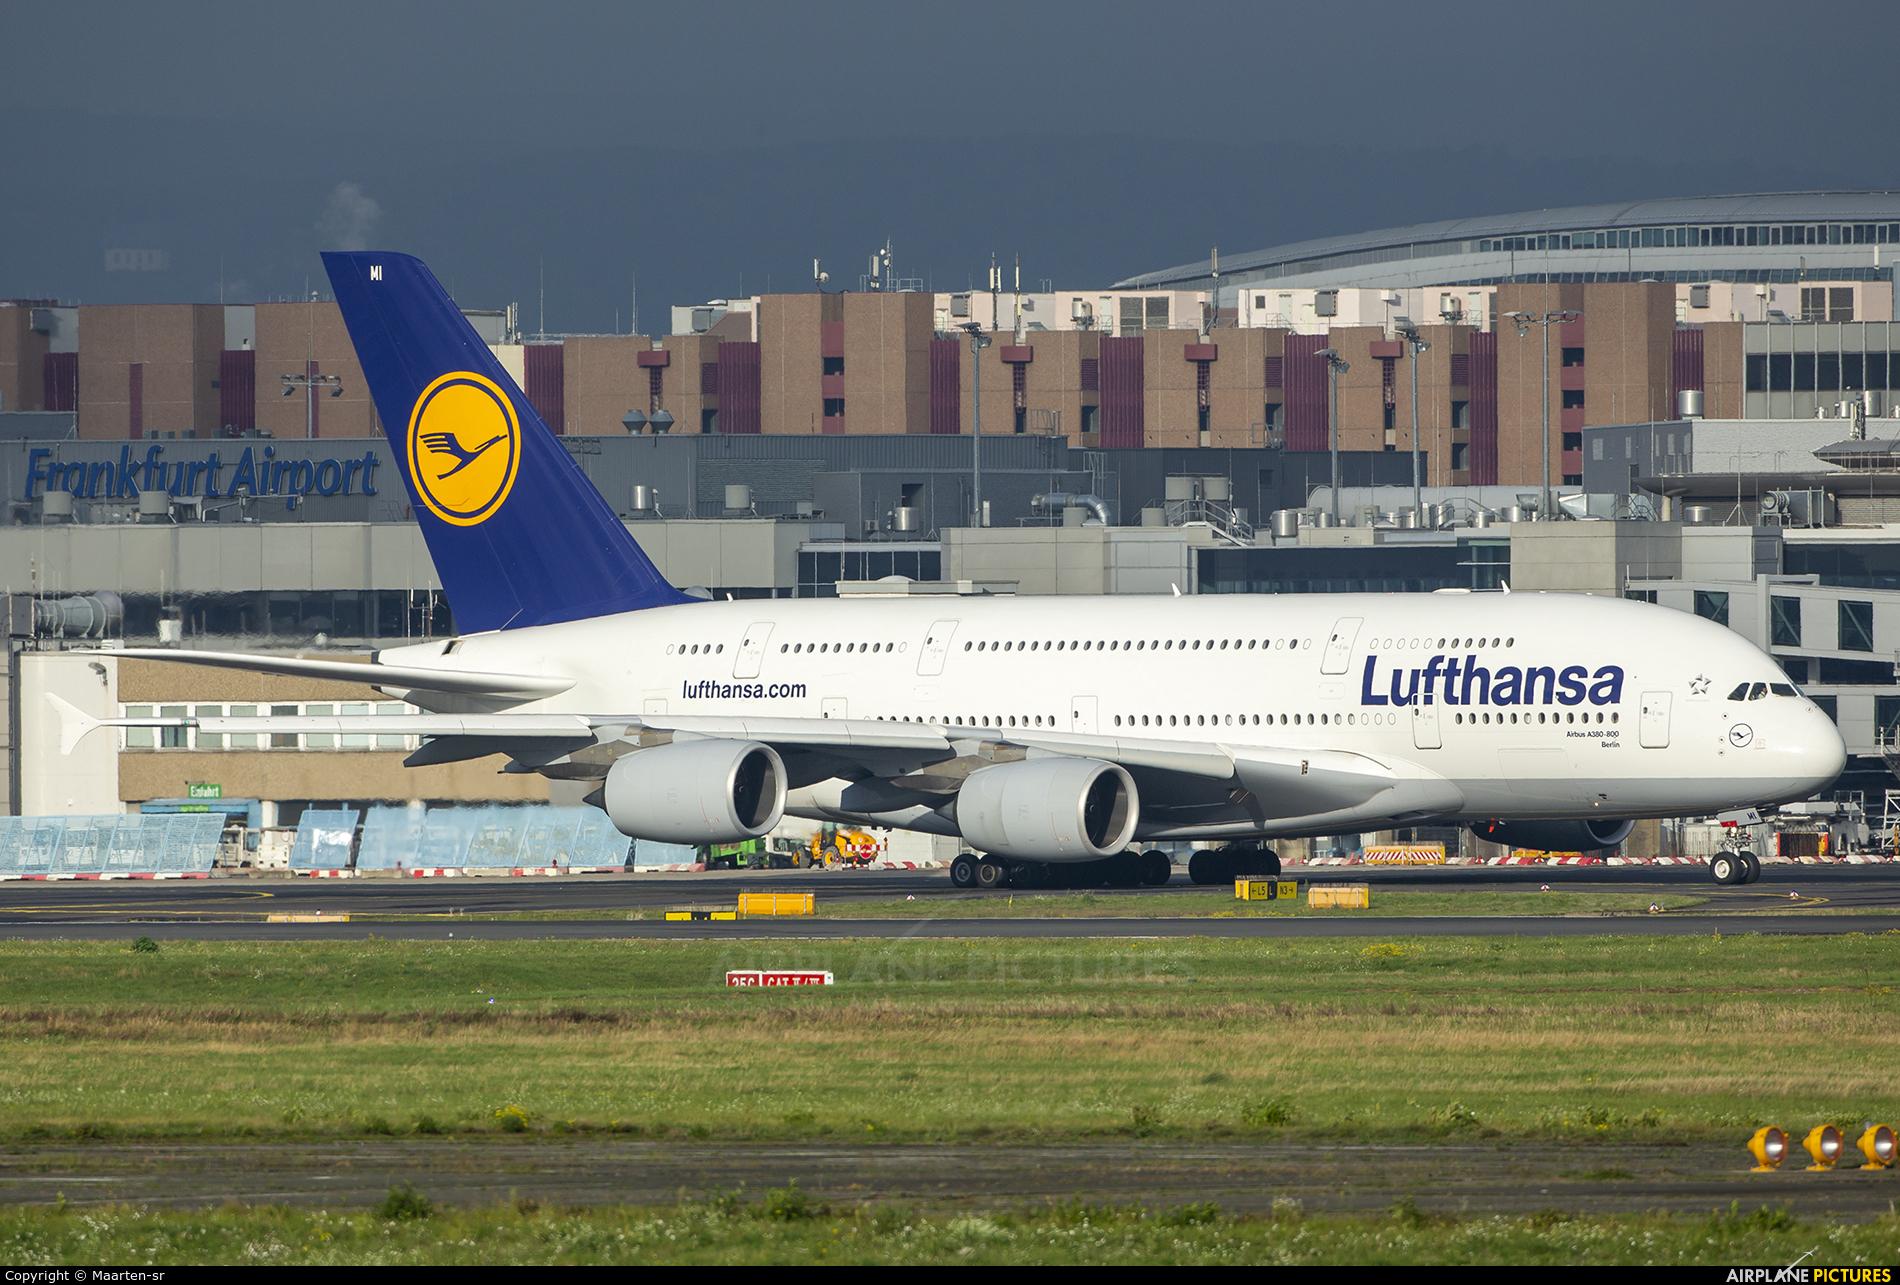 Lufthansa D-AIMI aircraft at Frankfurt